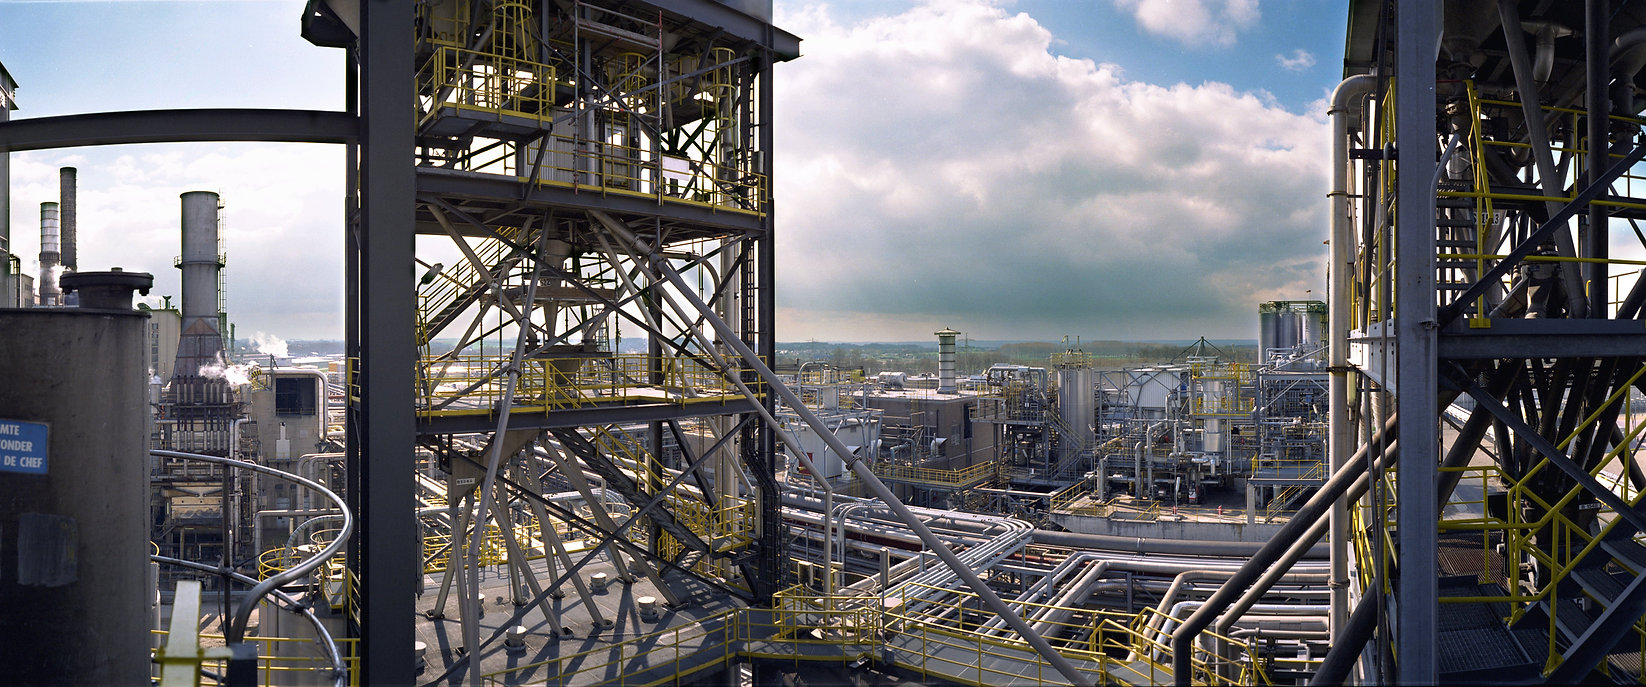 industriele procesinstallaties